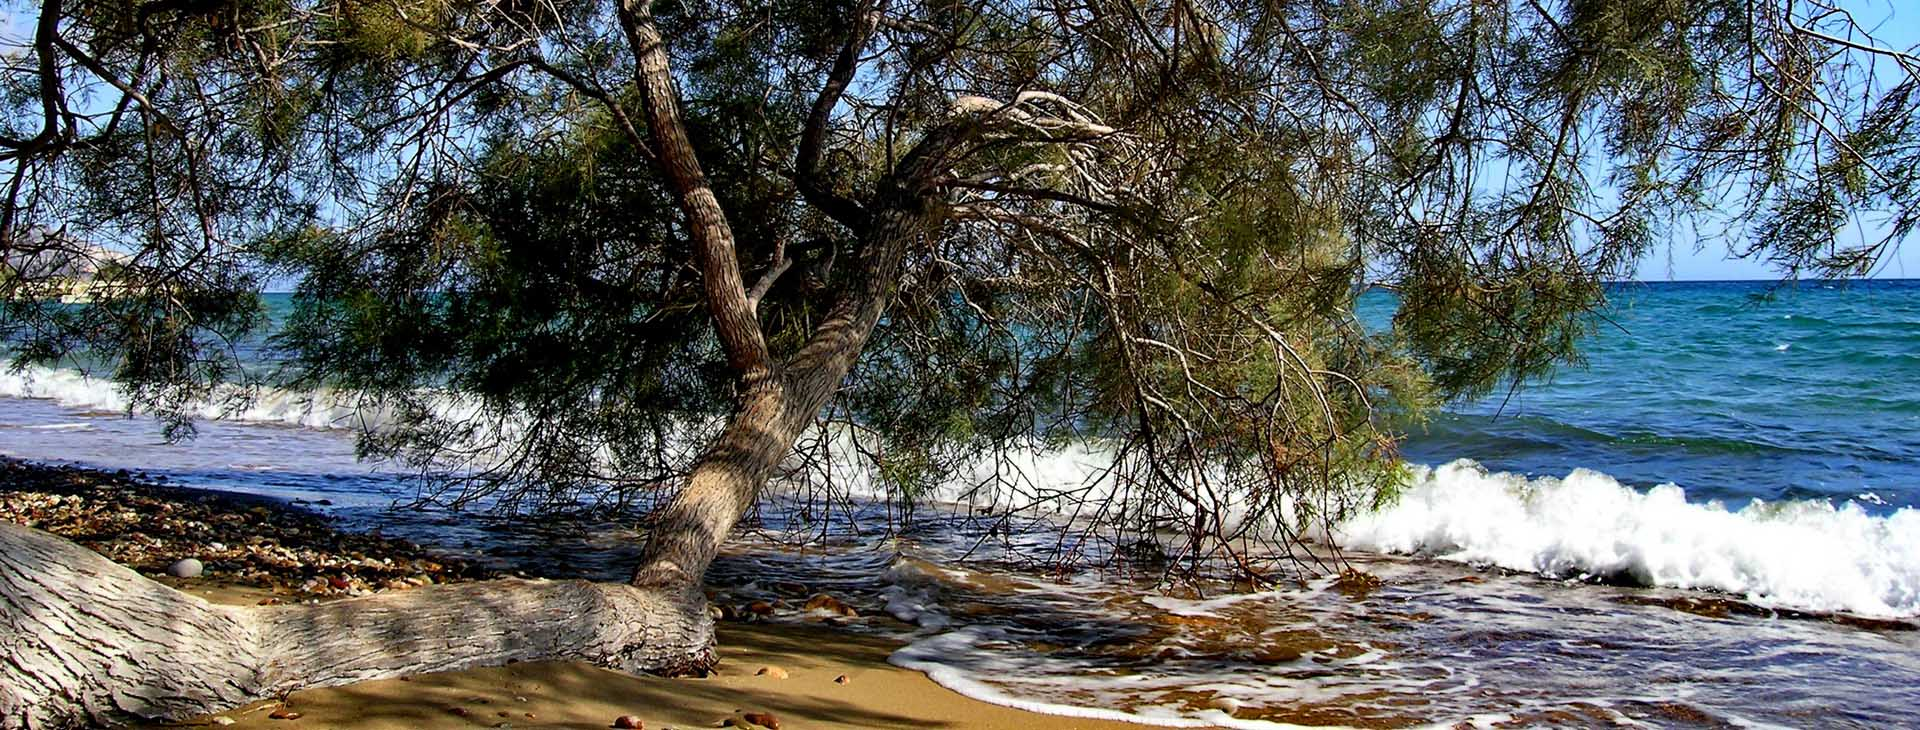 Aliki beach, Kimolos island